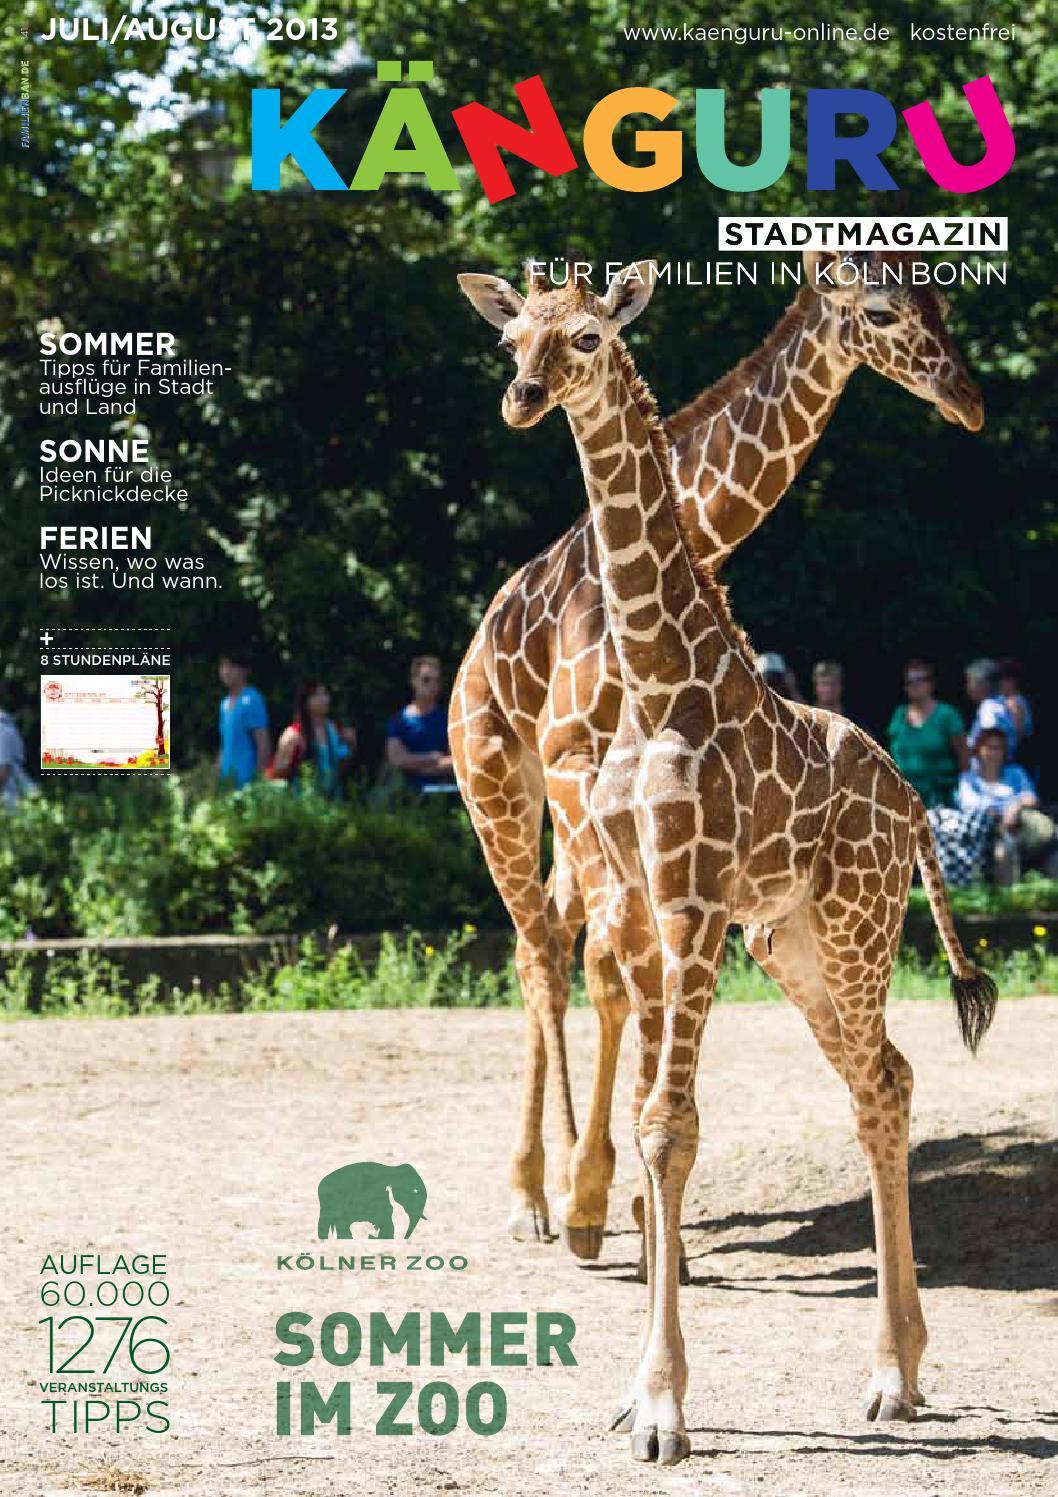 Känguru Stadtmagazin Für Familien In Köln Bonn Juliaugust